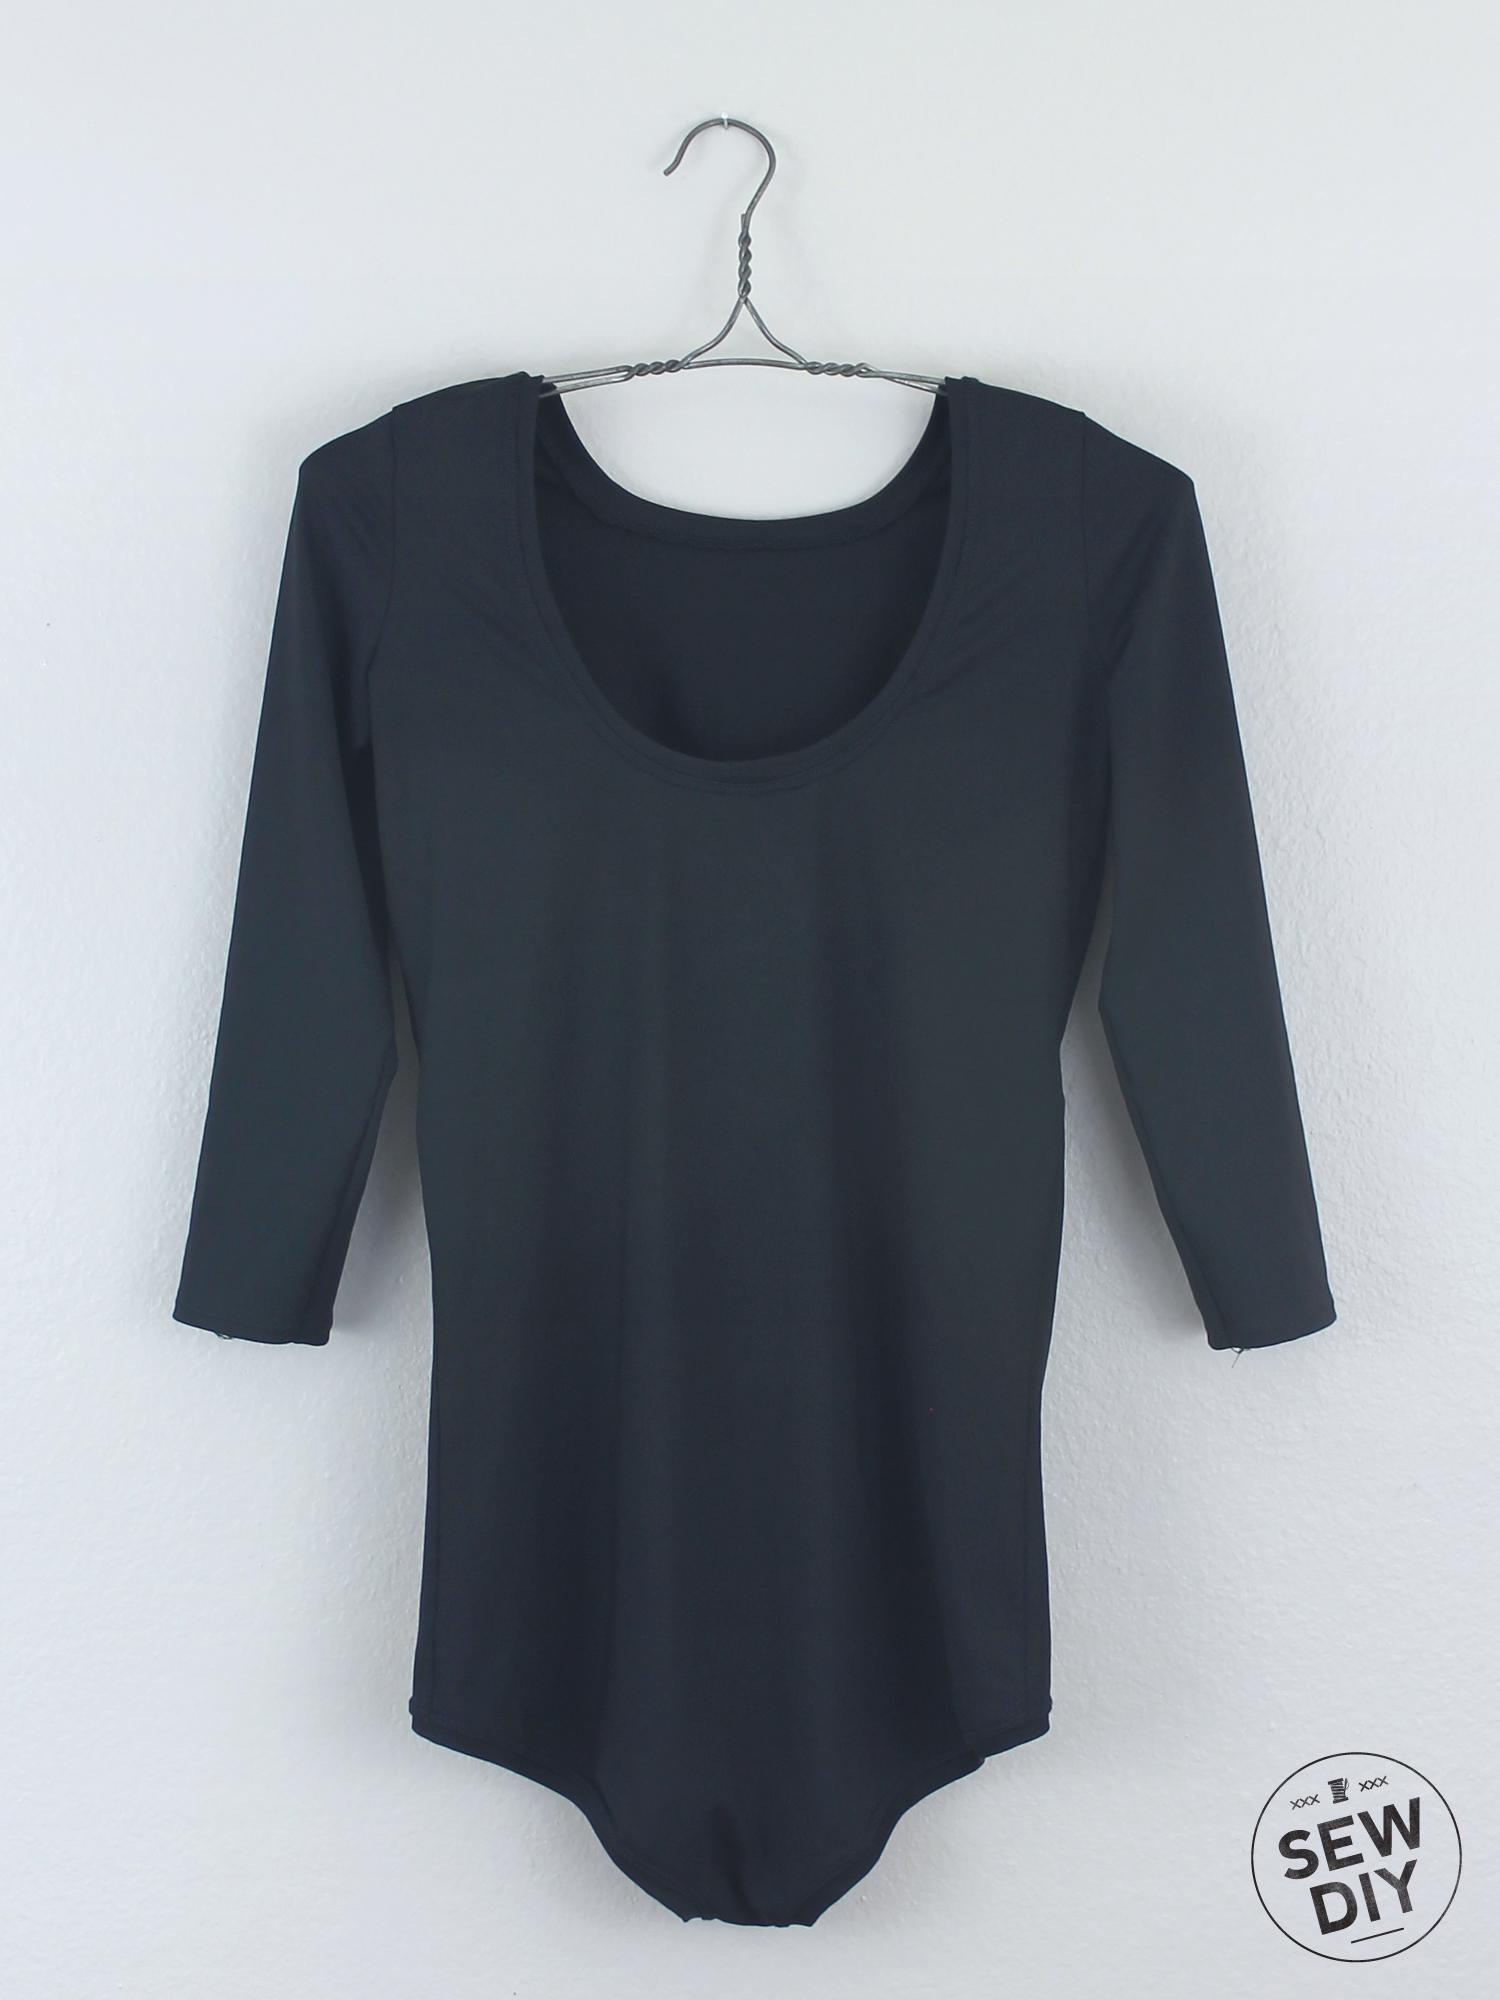 DIY Black Scoop Back Nettie Bodysuit – Sew DIY